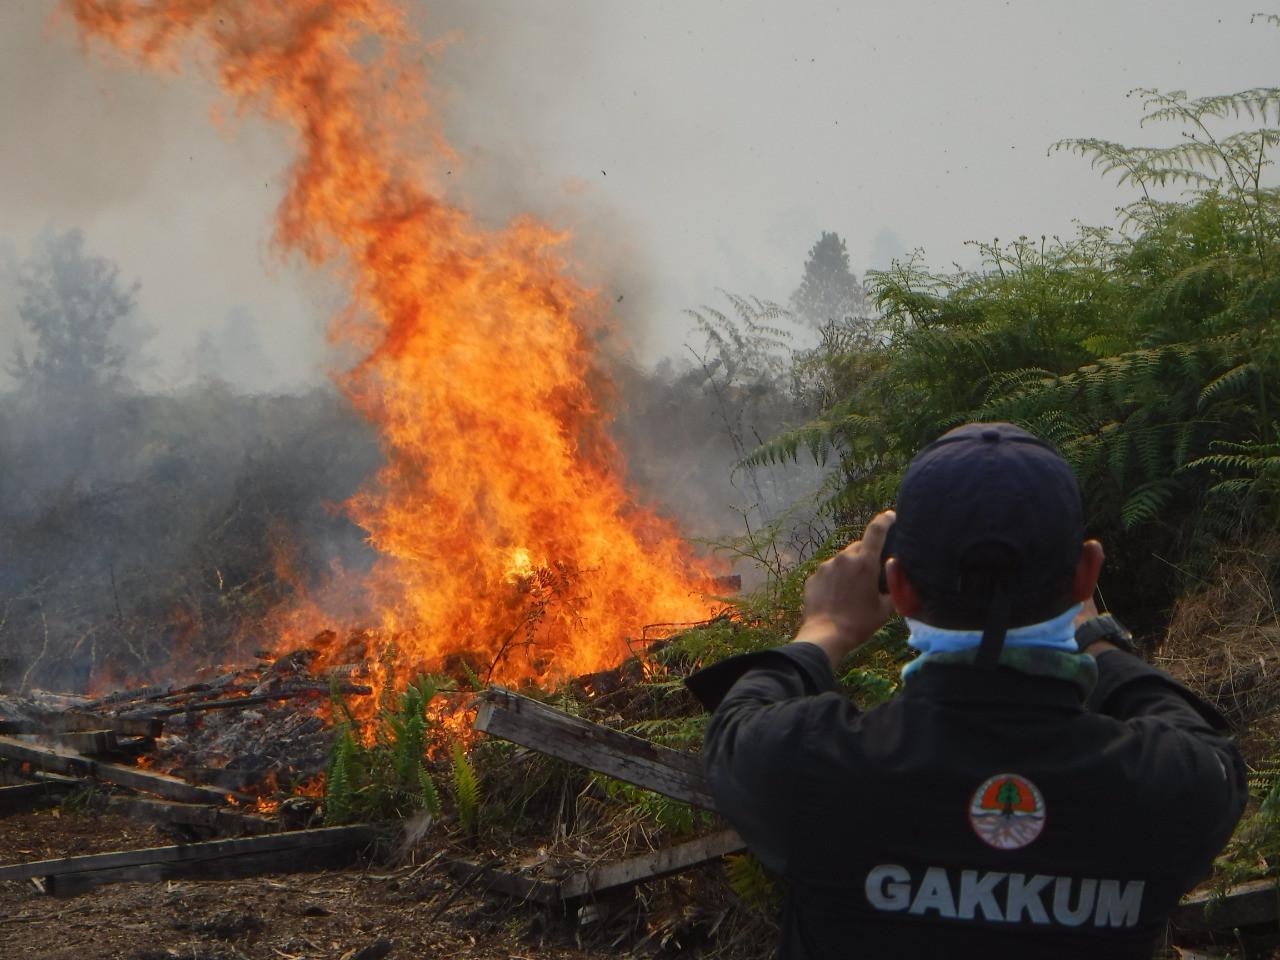 Jokowi warns on danger of hotspots as dry season hits